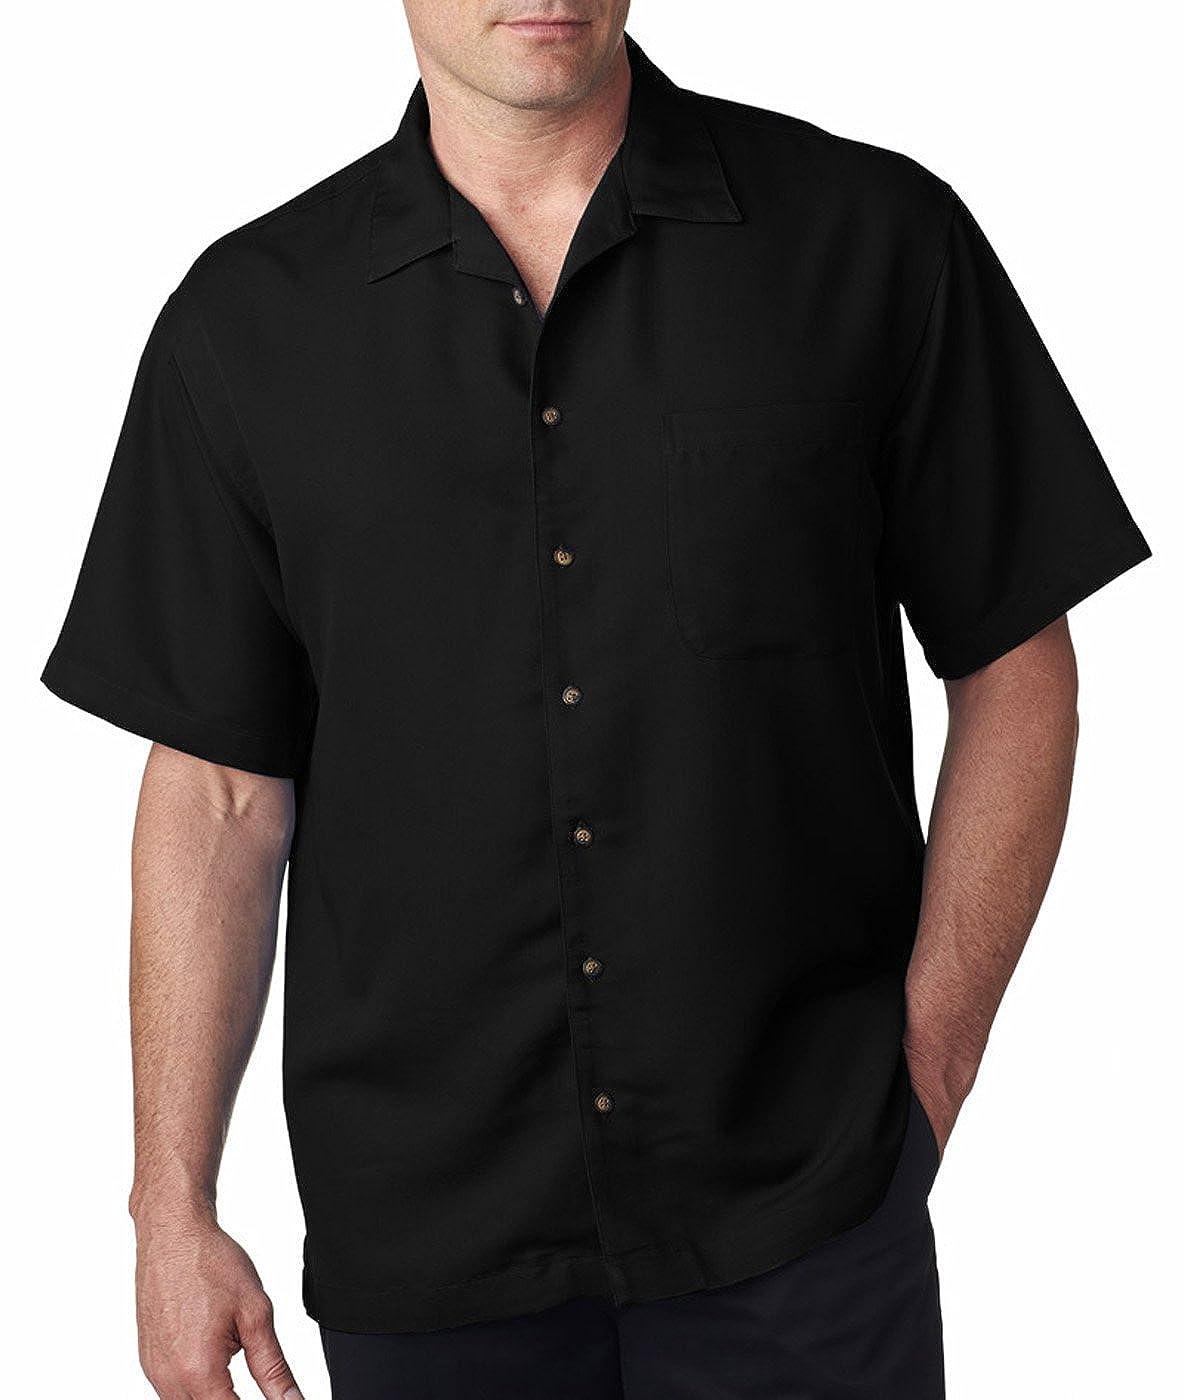 46b8ed3c647d0 UltraClub Men's Cabana Breeze Camp Shirt